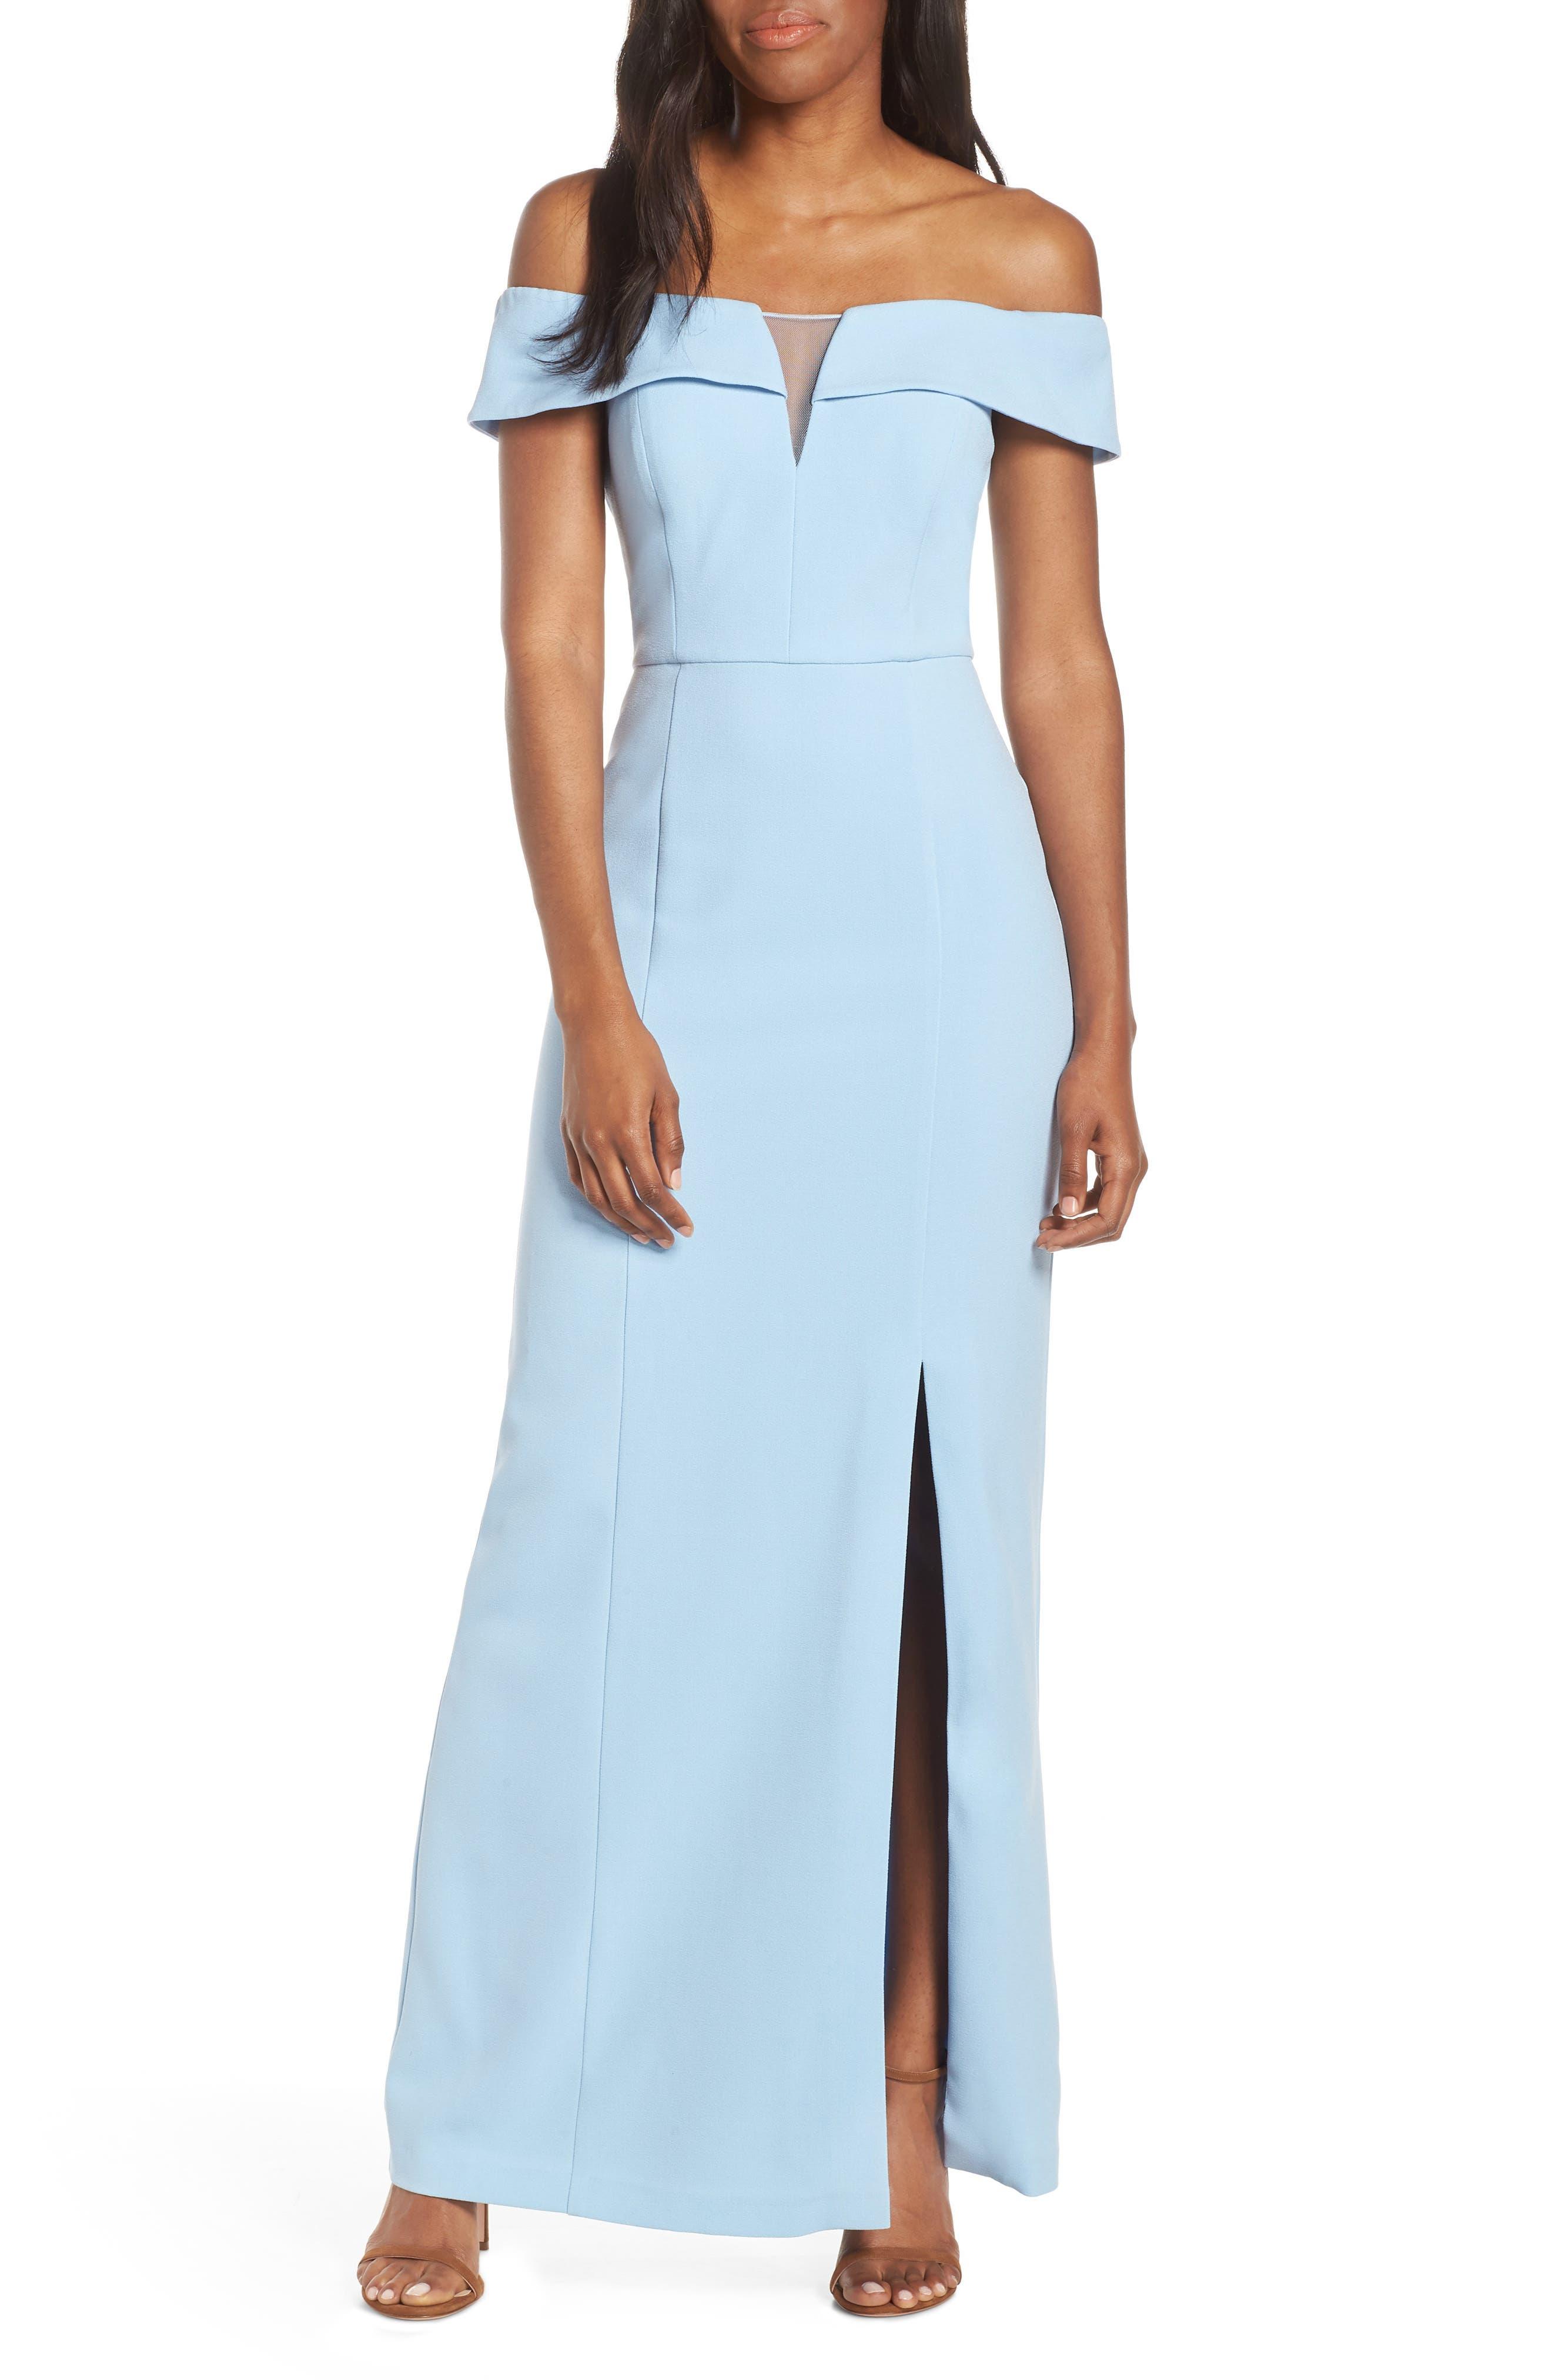 Sears Juniors Prom Dresses